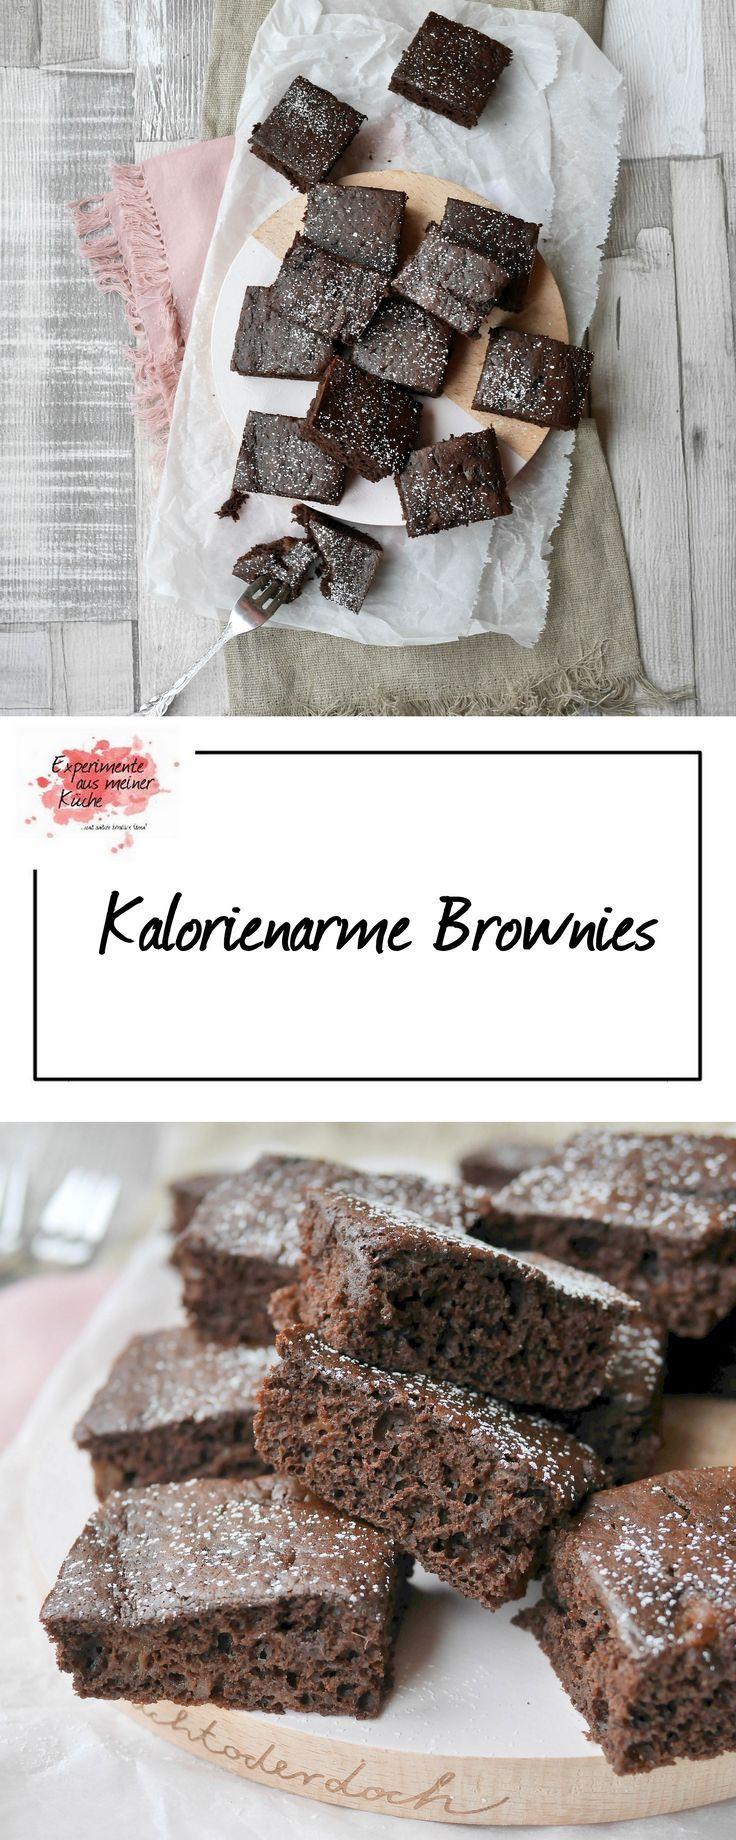 Low calorie brownies Low calorie brownies - -